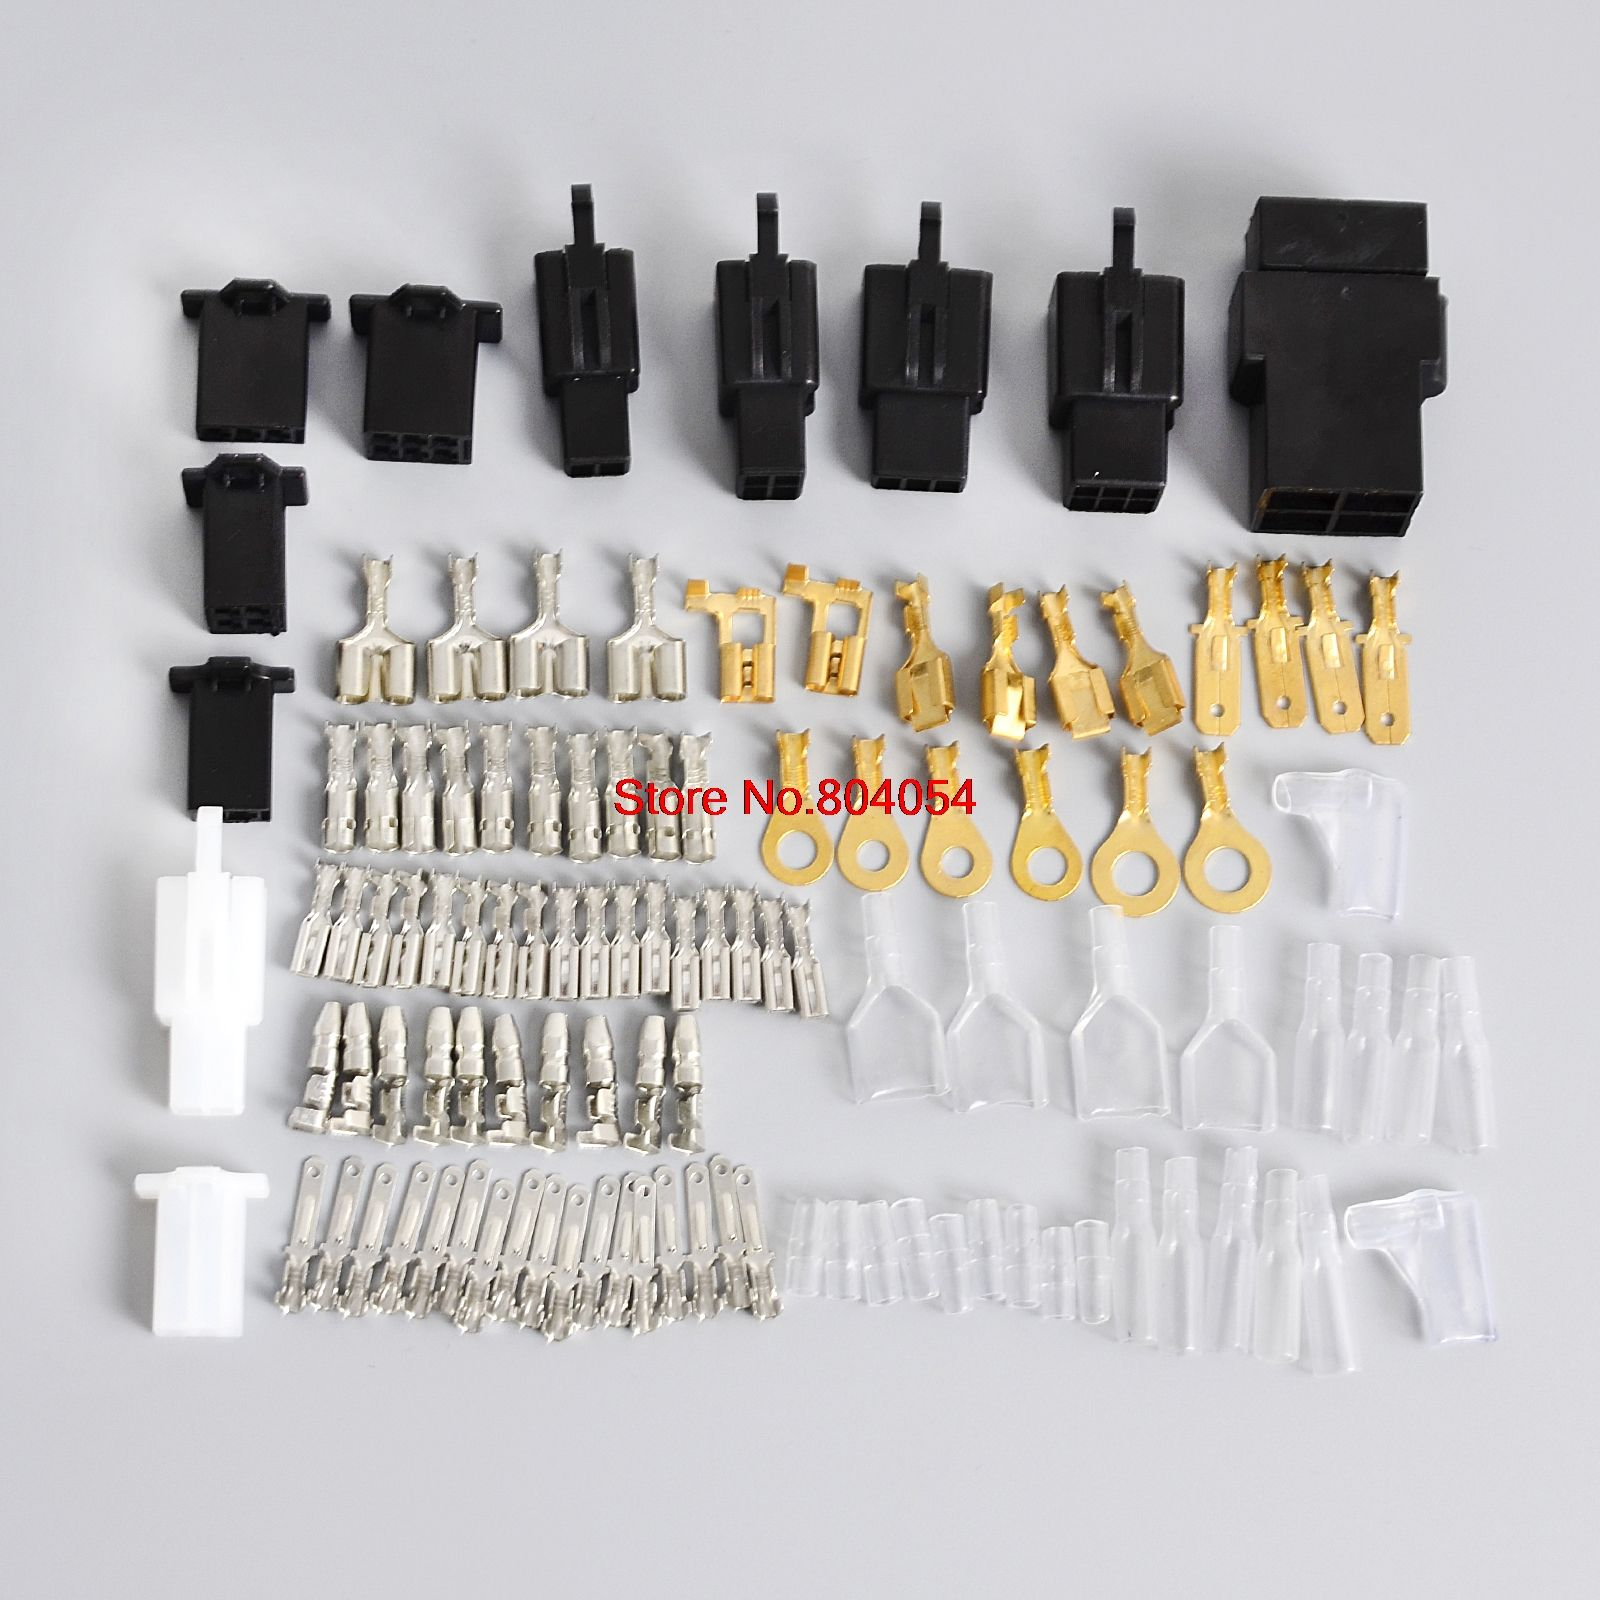 for honda motorcycle electrical wiring harness loom repair kit plugs bullets connectors [ 1600 x 1600 Pixel ]